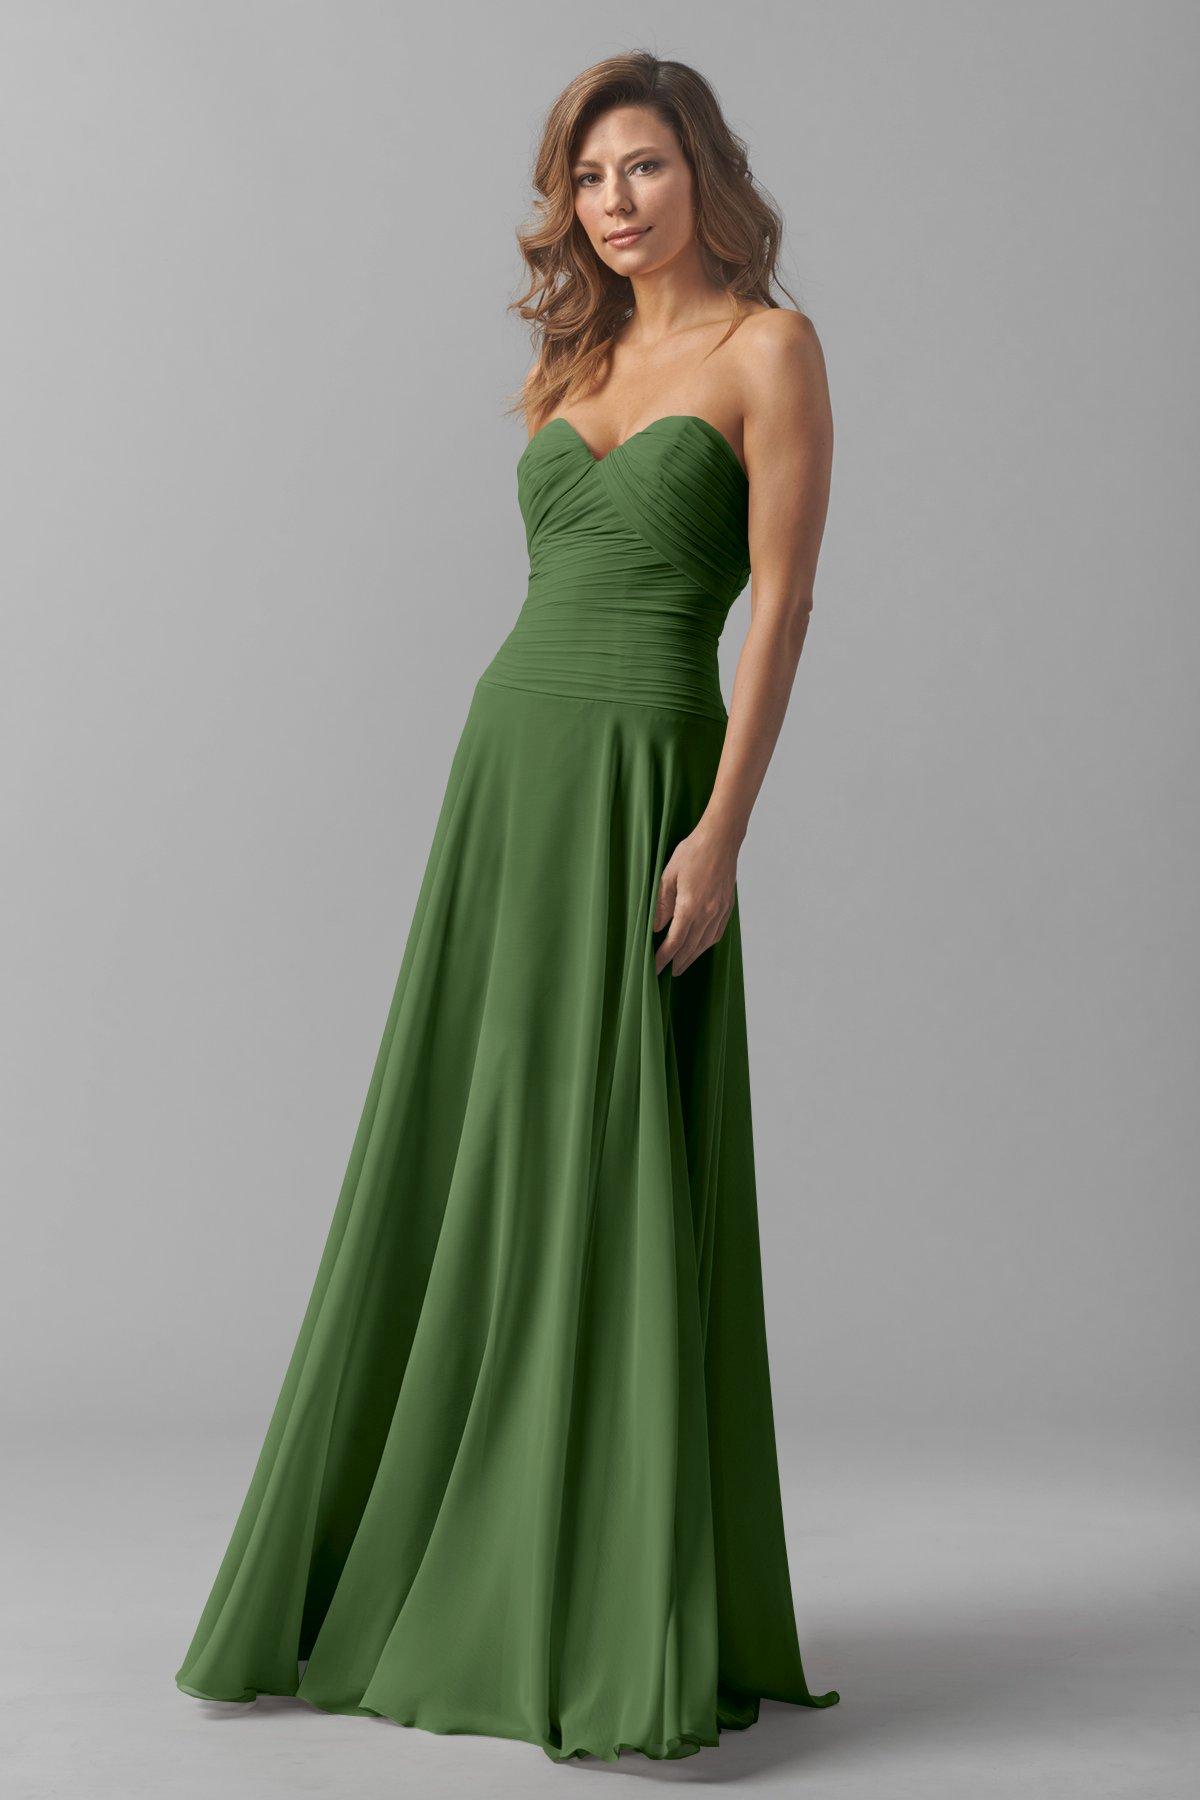 Flora Green Sweetheart Bridesmaid